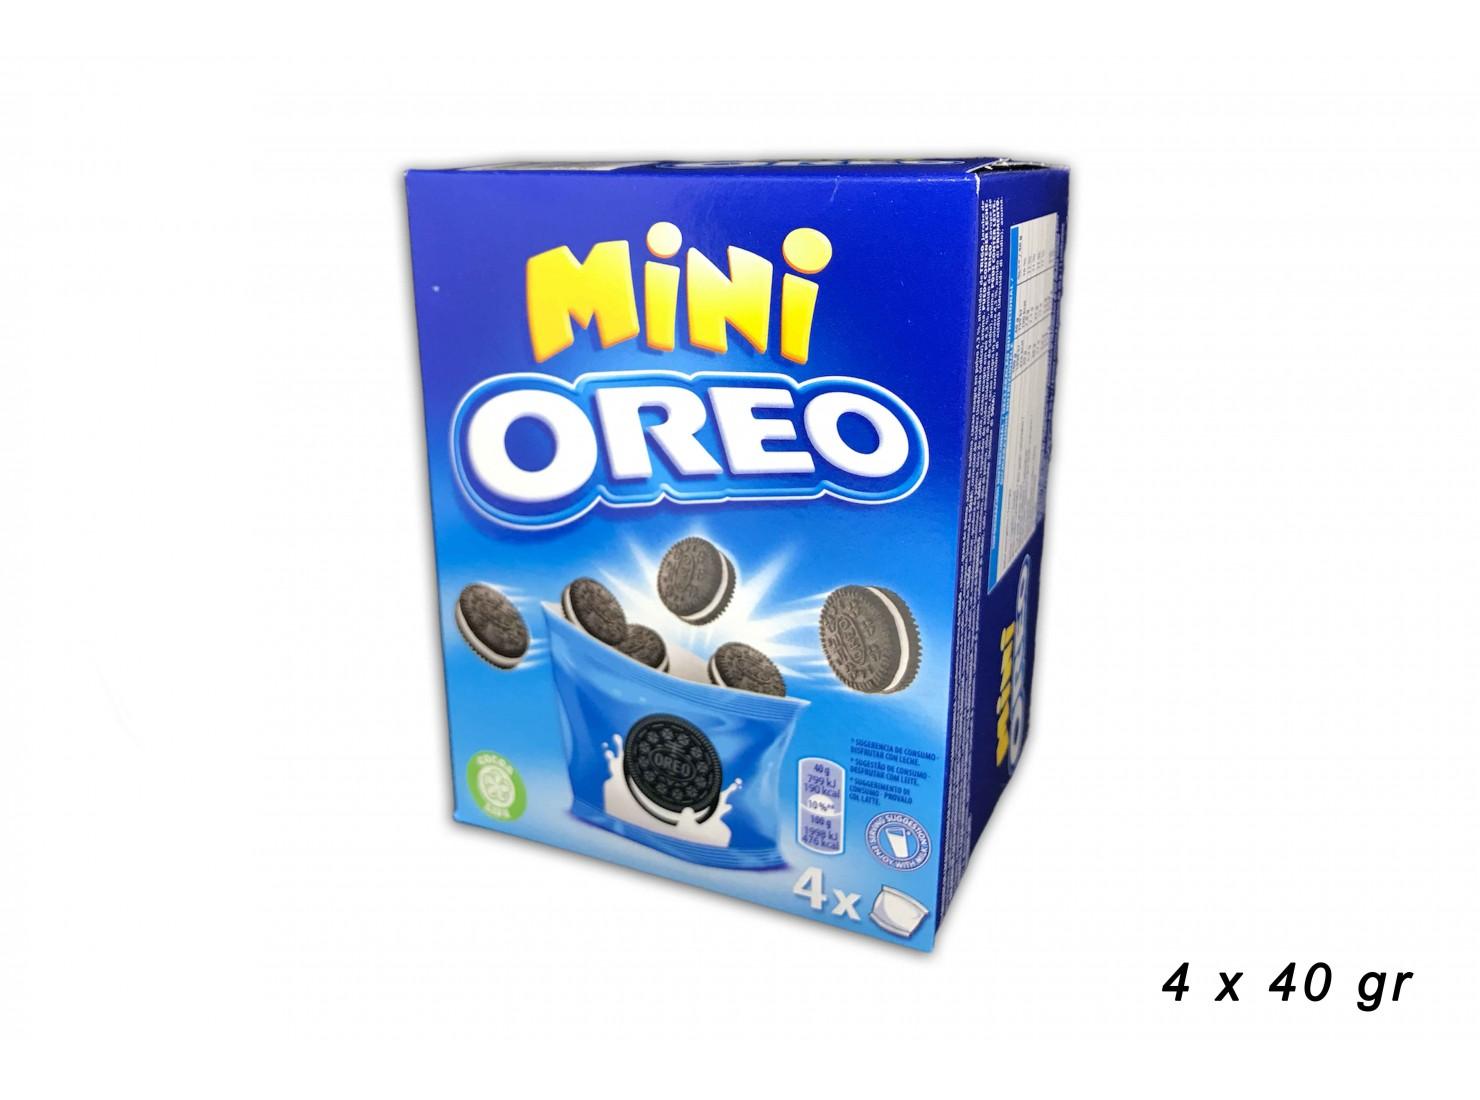 OREO 4 X 40 GR MINI